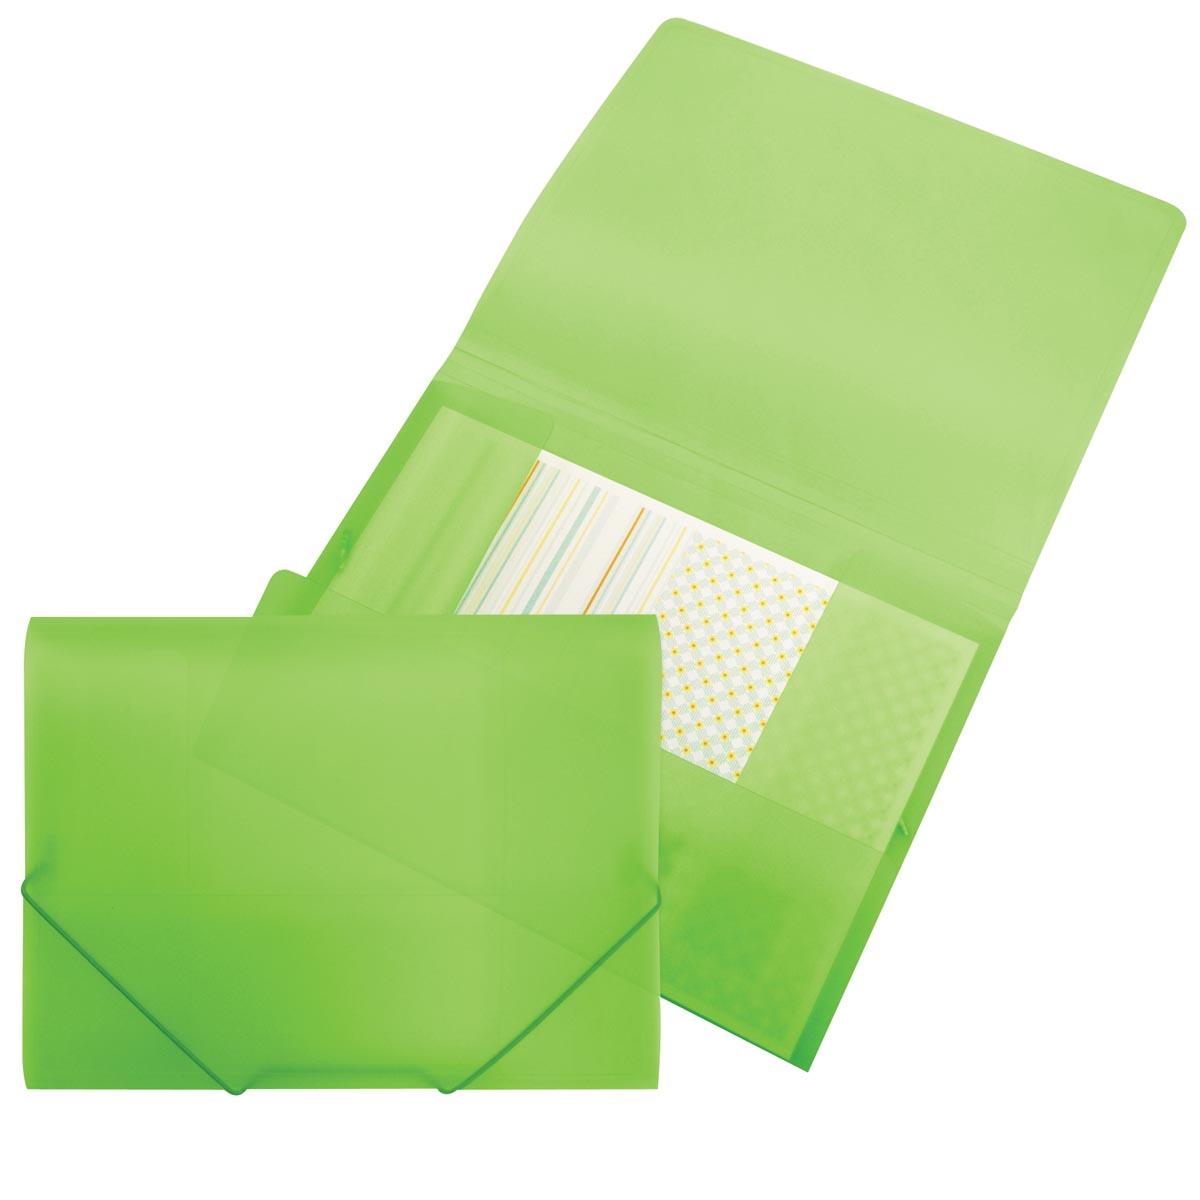 Beautone elastomap met kleppen, ft A4, groen